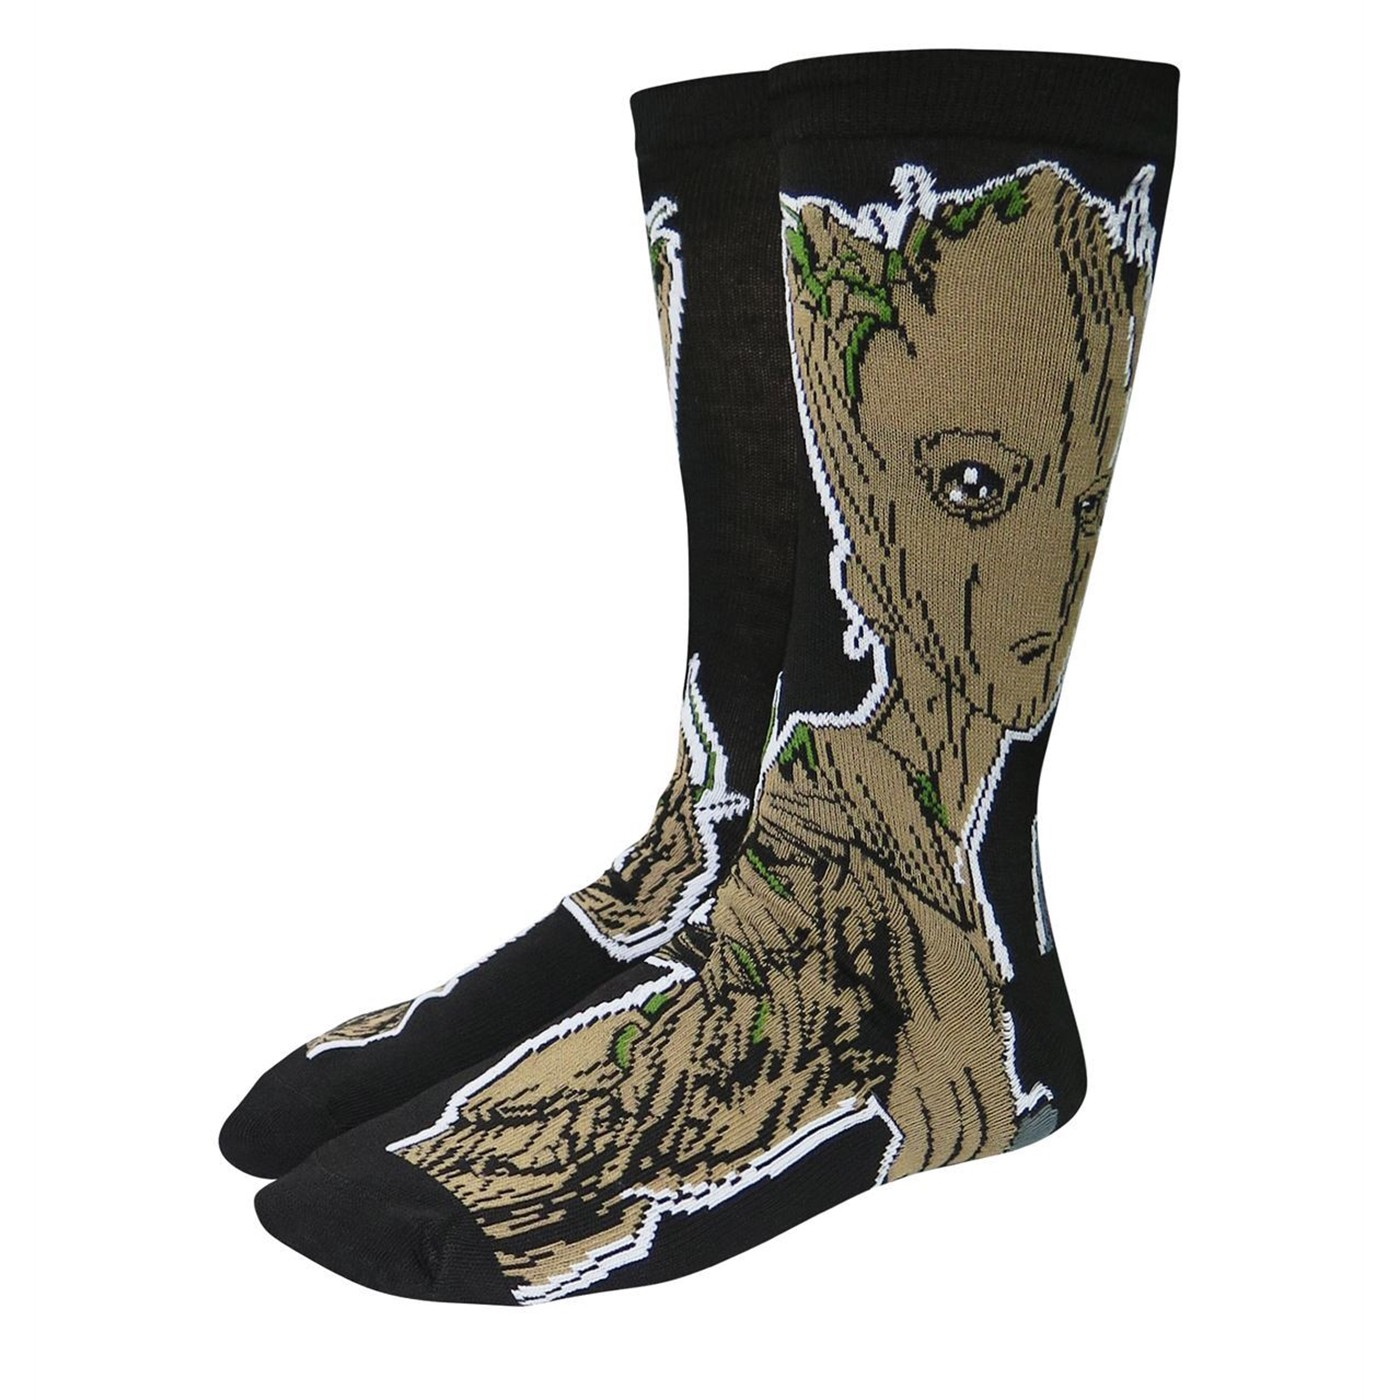 Infinity War GOTG Groot Crew Socks